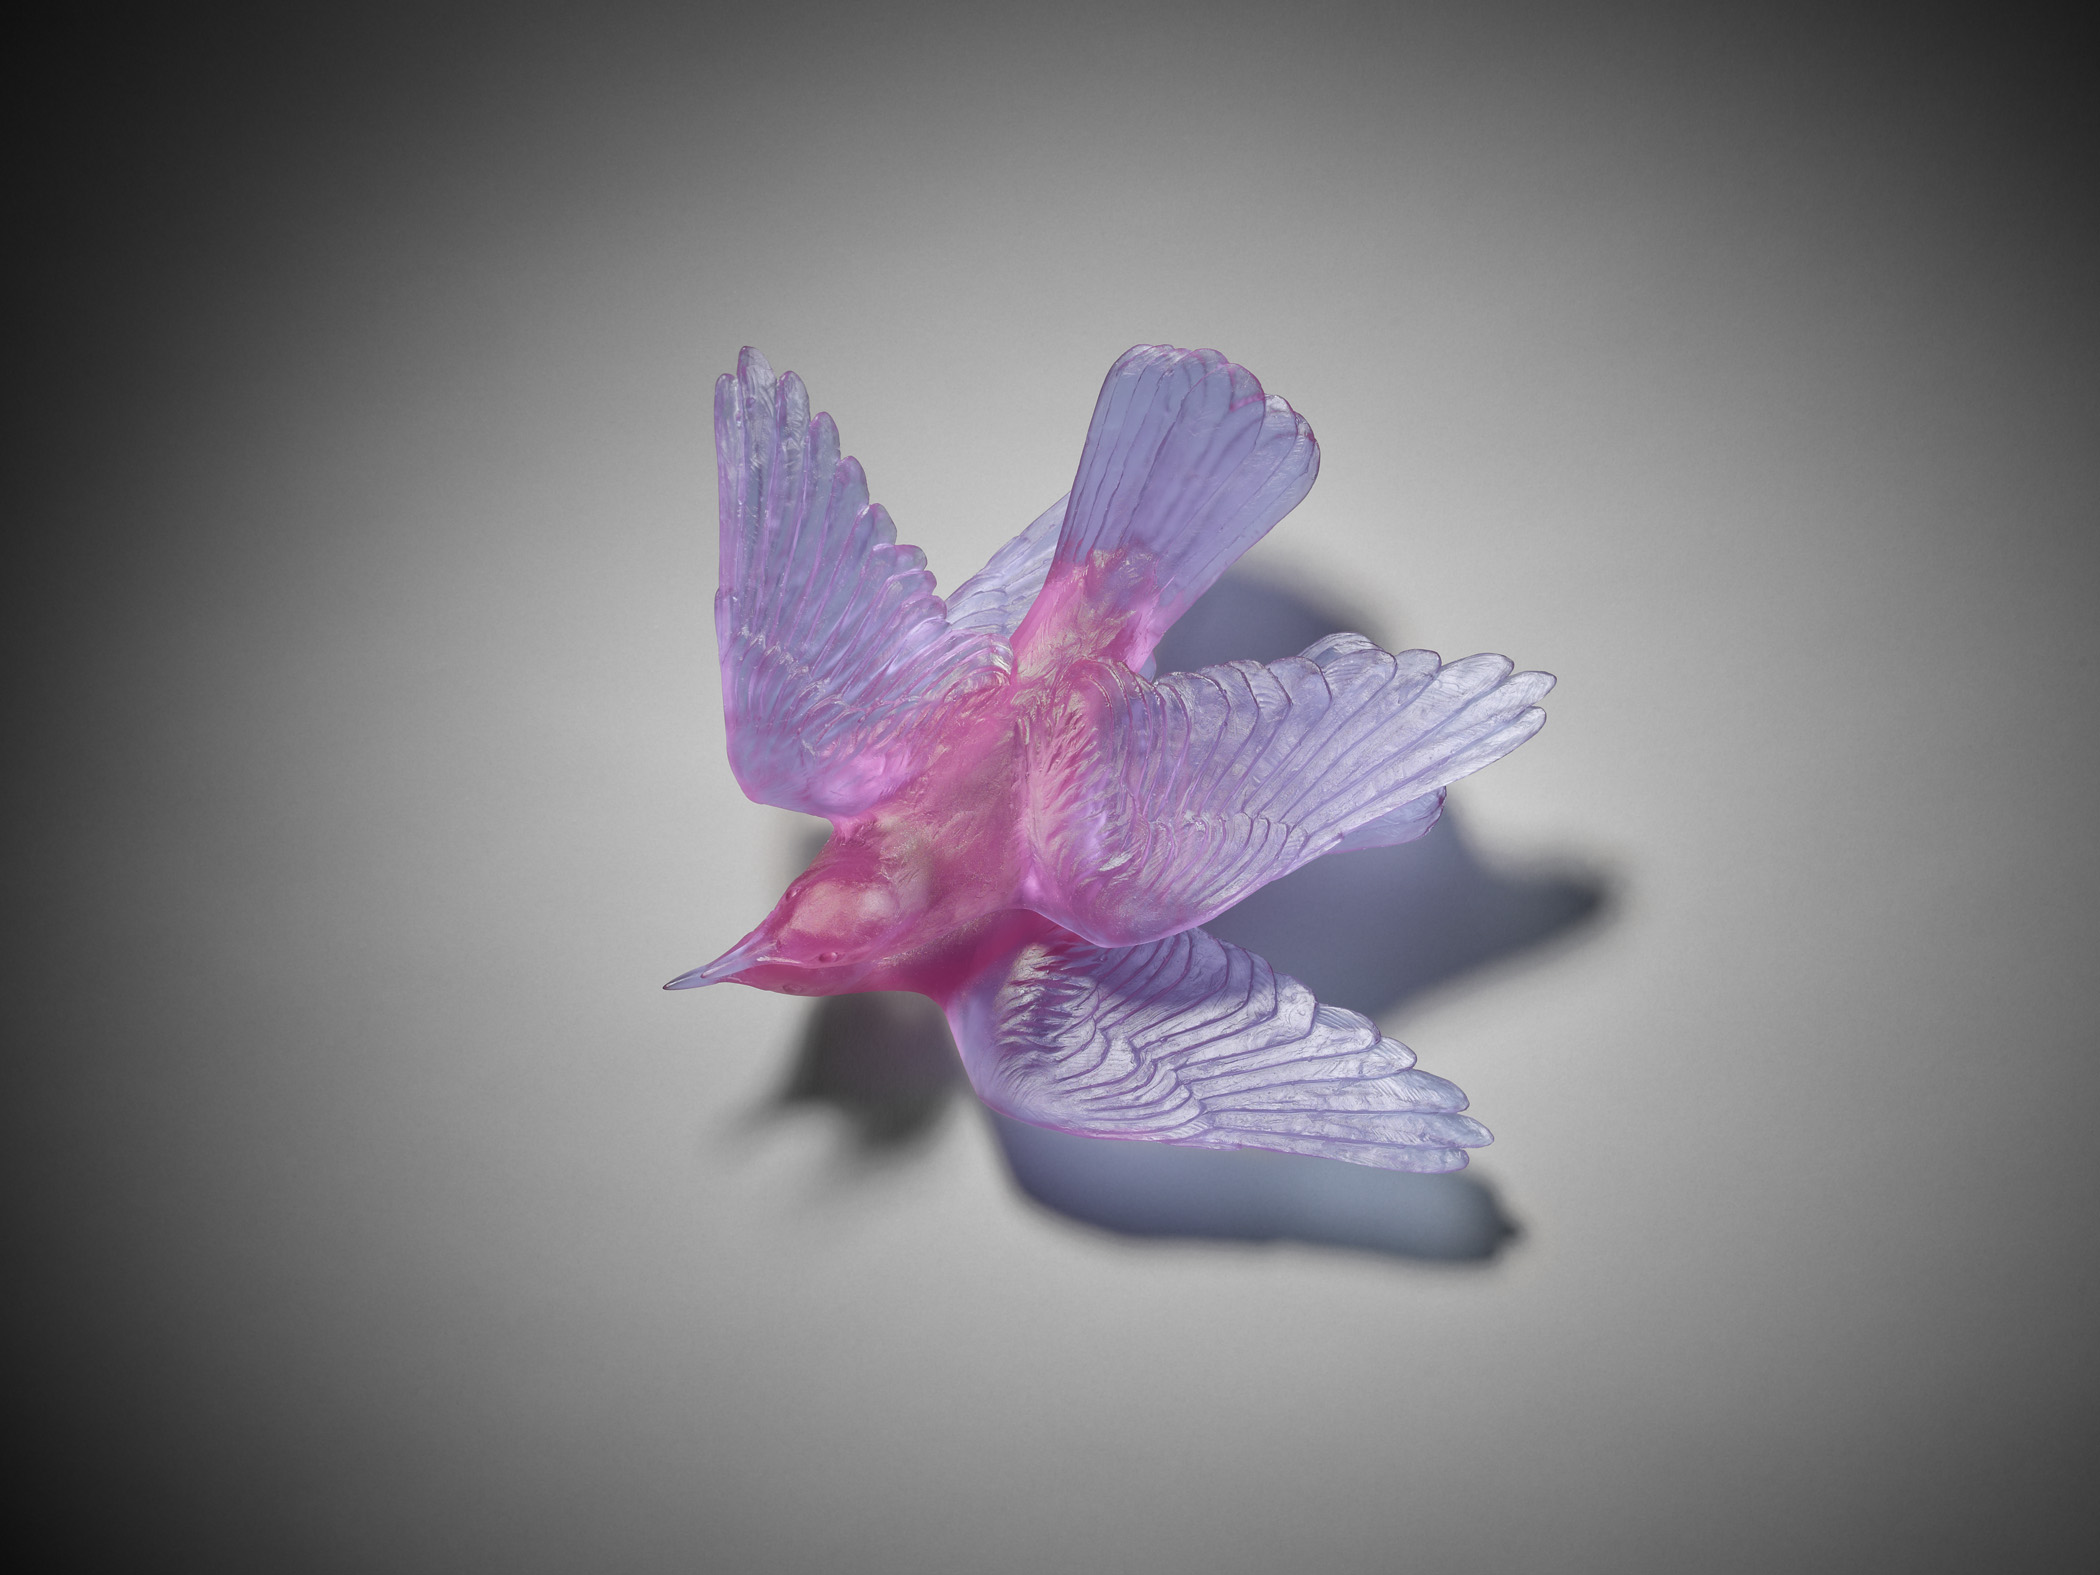 Lilac, Katherine Rutecki, 2011